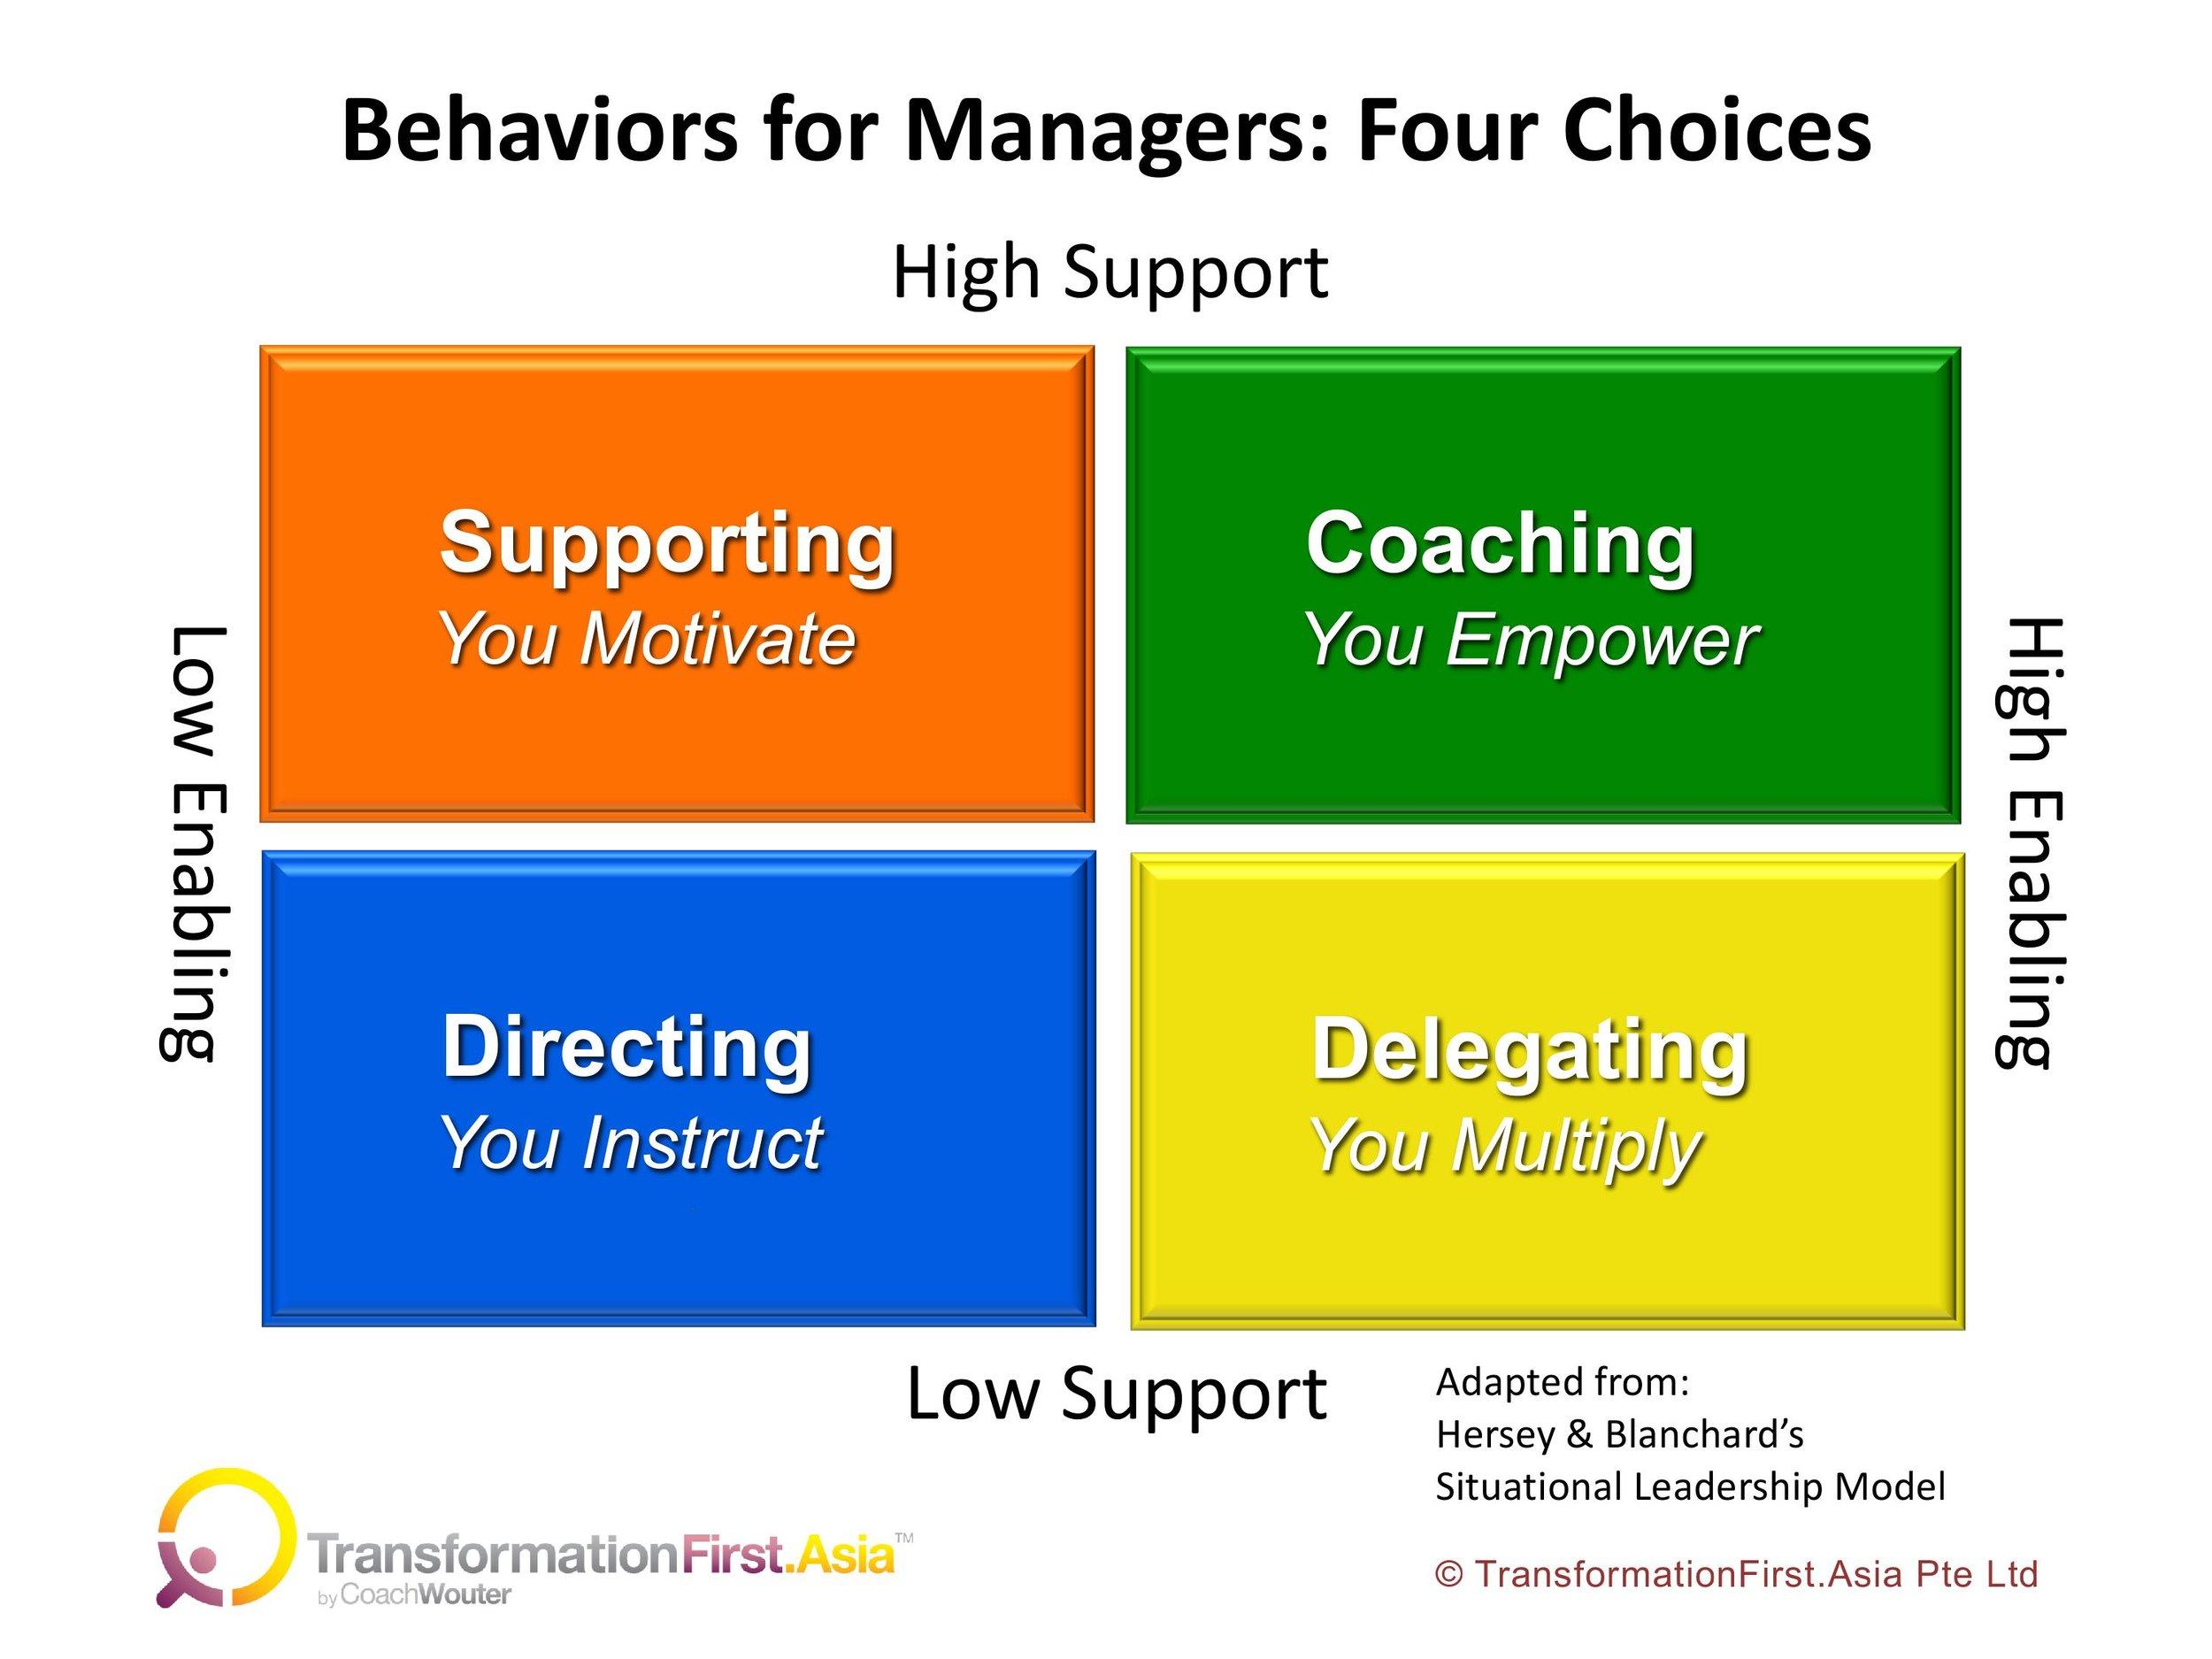 Behaviors for Managers - Four Choices - 20 Mar 2019.jpg